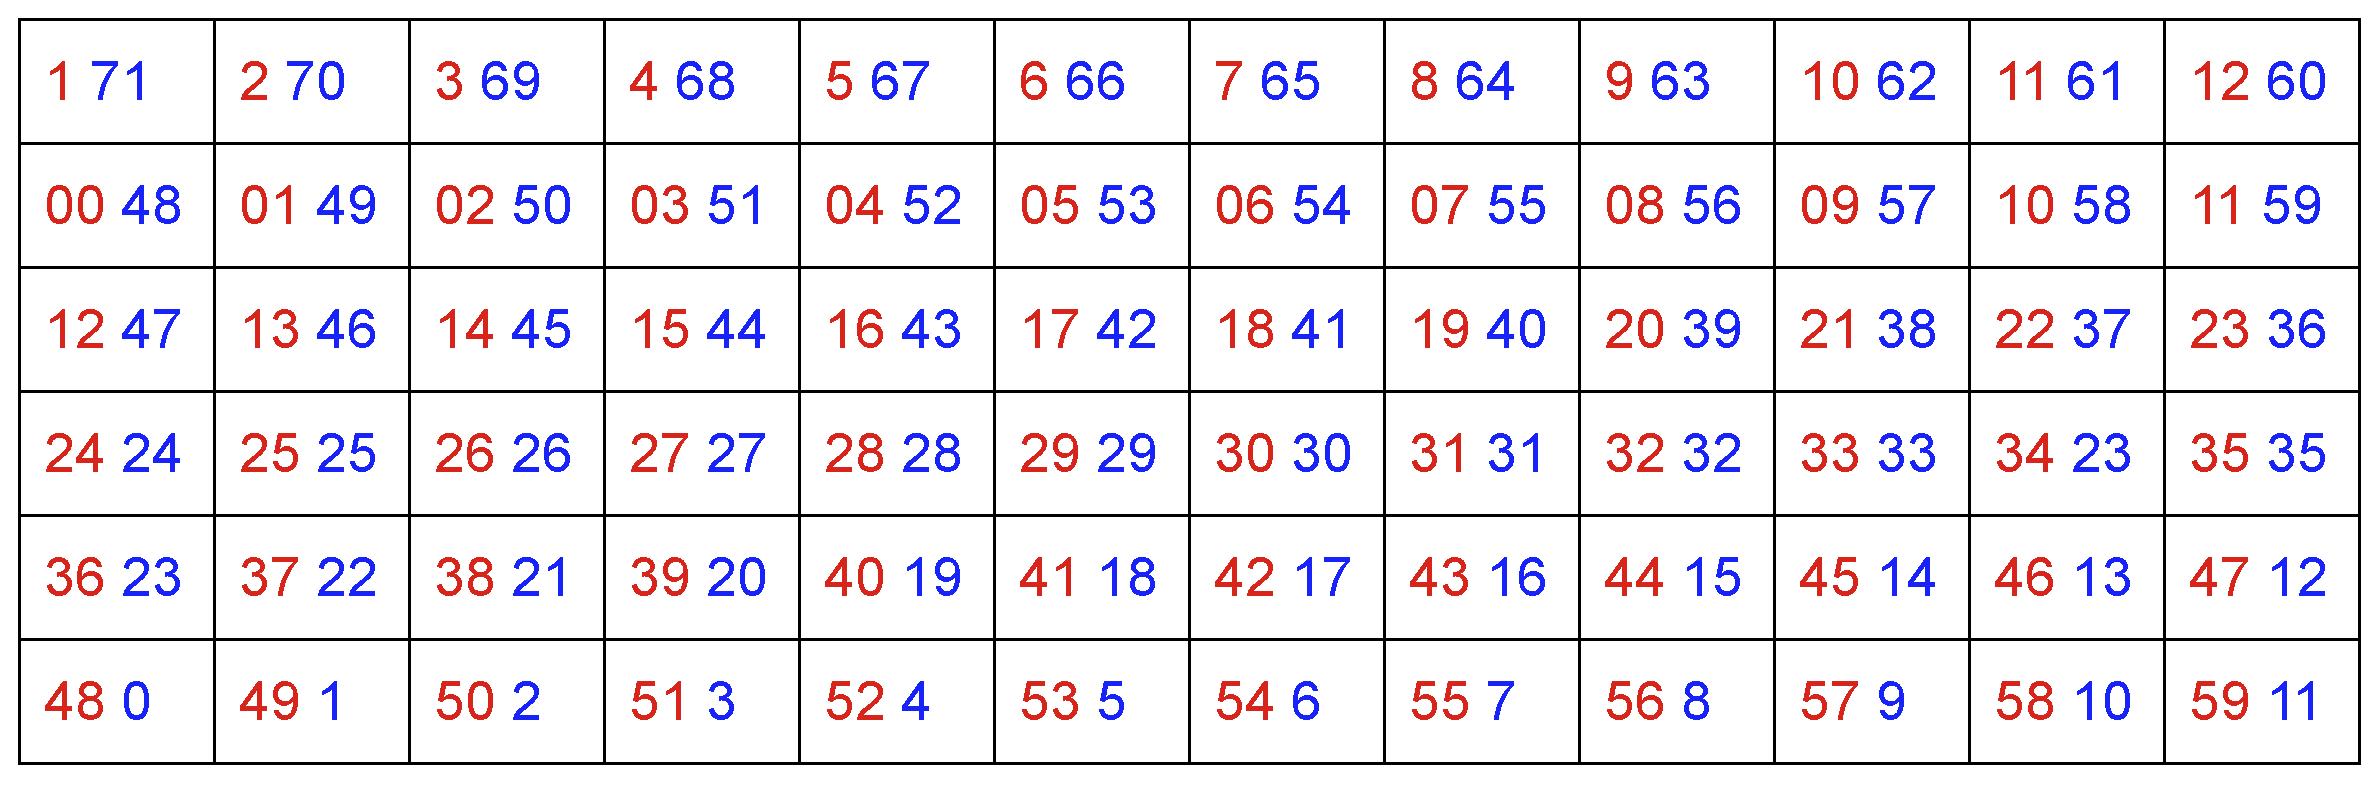 Scrolling Nav Start Bootstrap Template Rtcc Panel Wiring Diagram Figure Dotstar Address Table